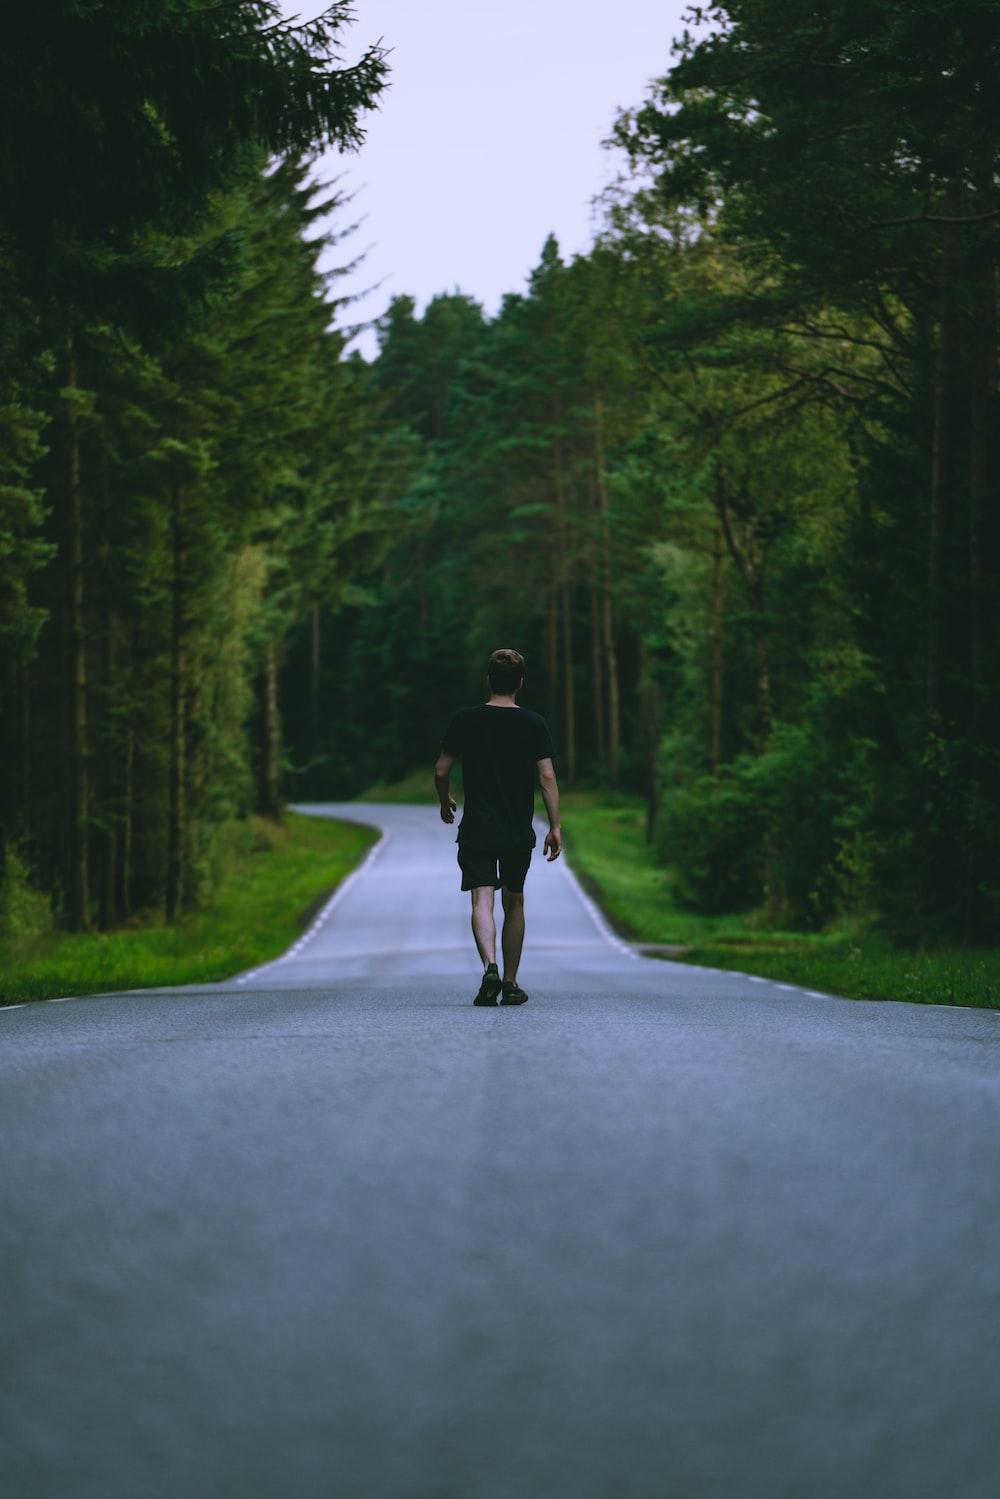 man in black t-shirt and black shorts walking on road during daytime